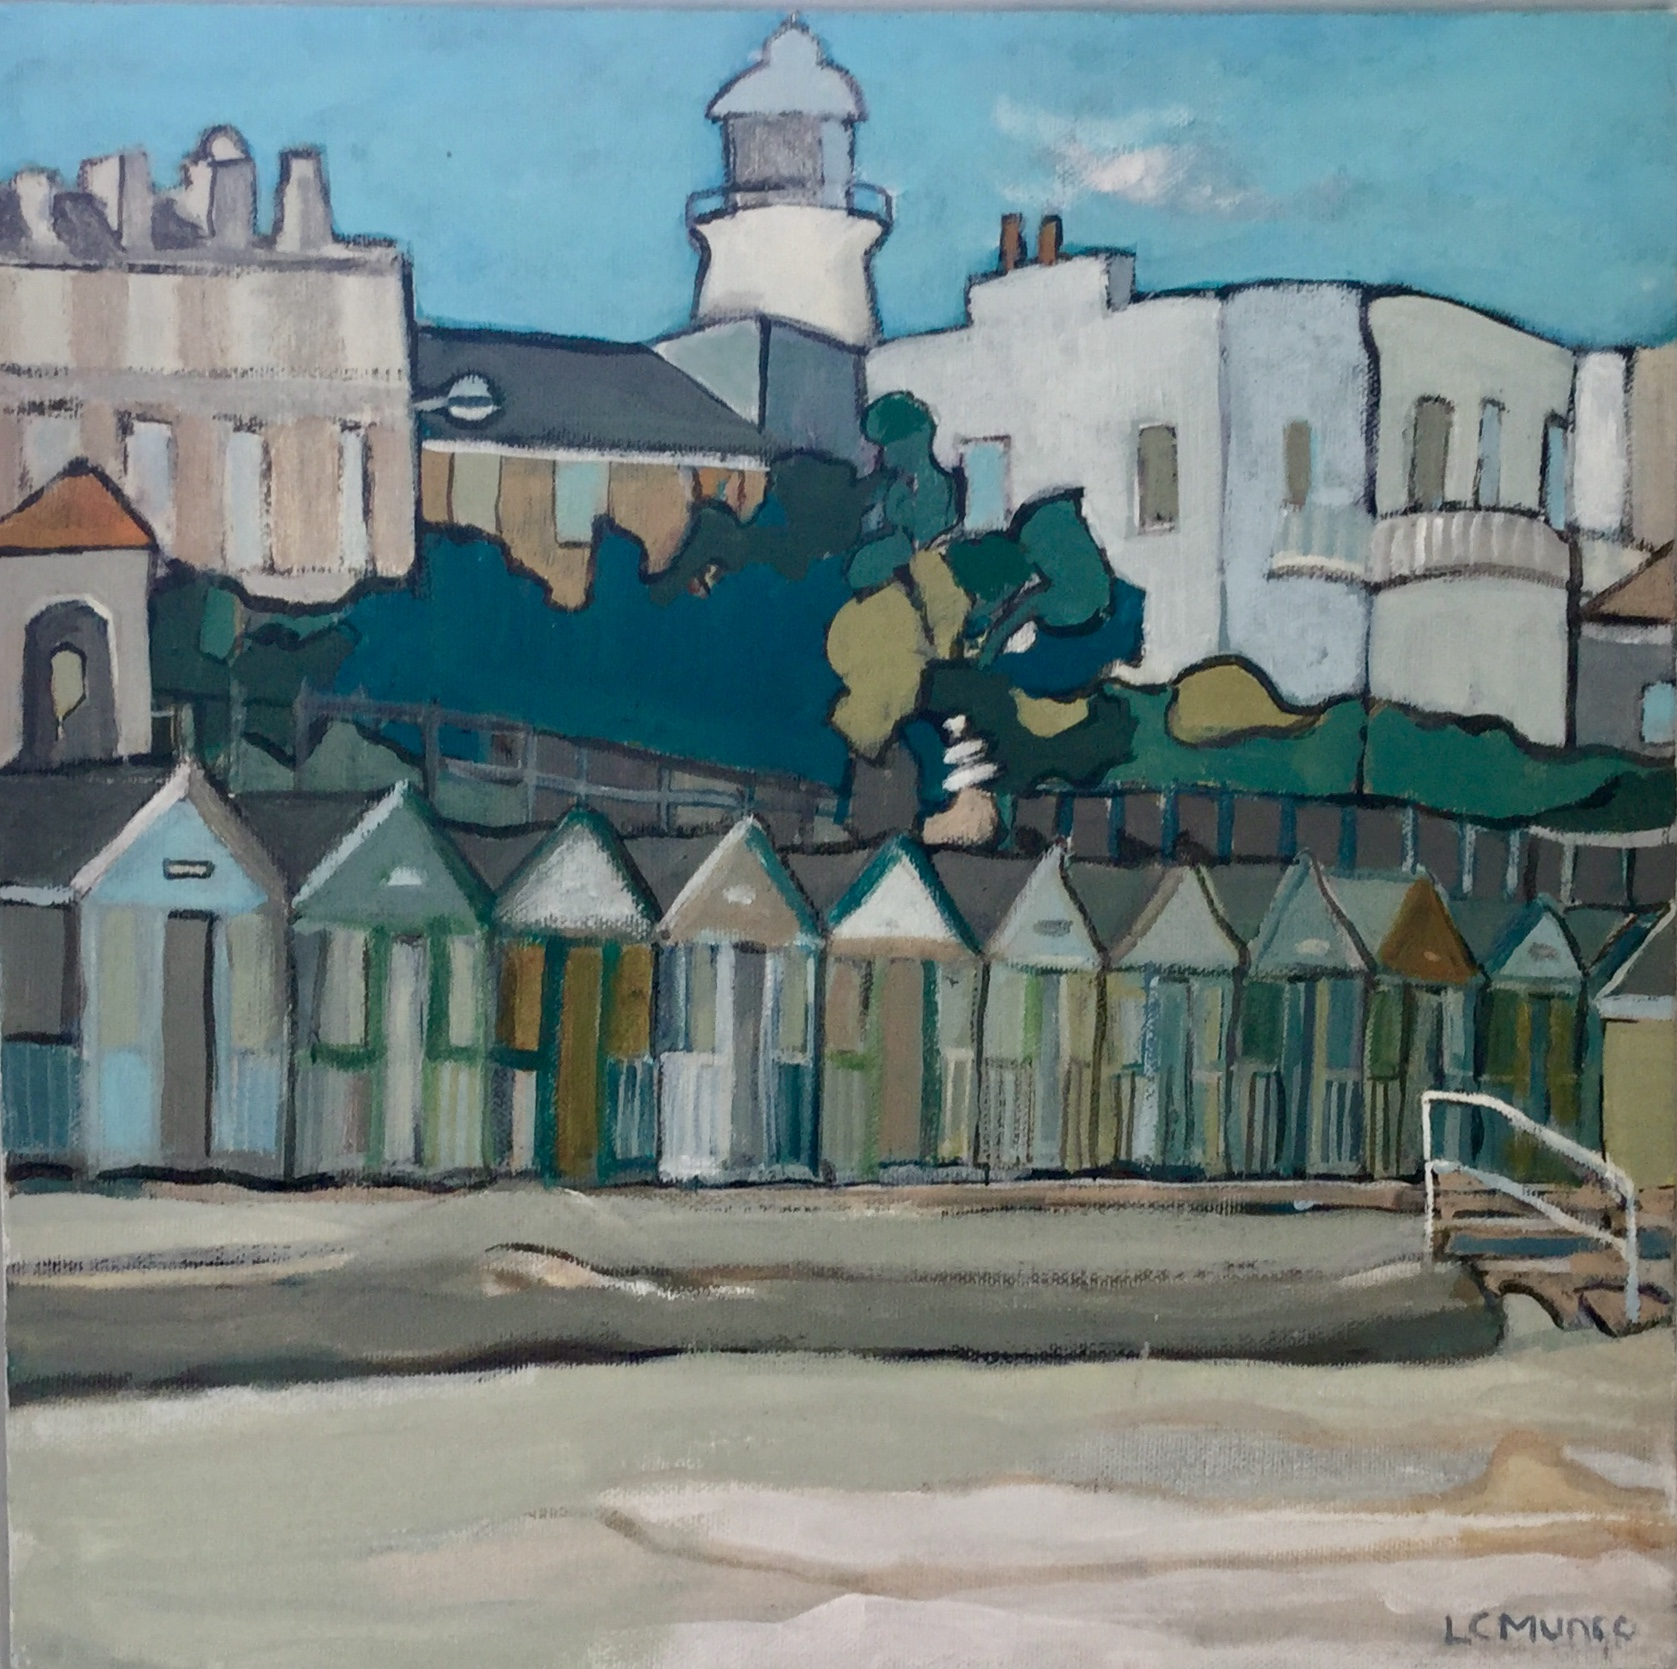 BEACH HUTS 2018: 35 x 35 cm: Acrylic